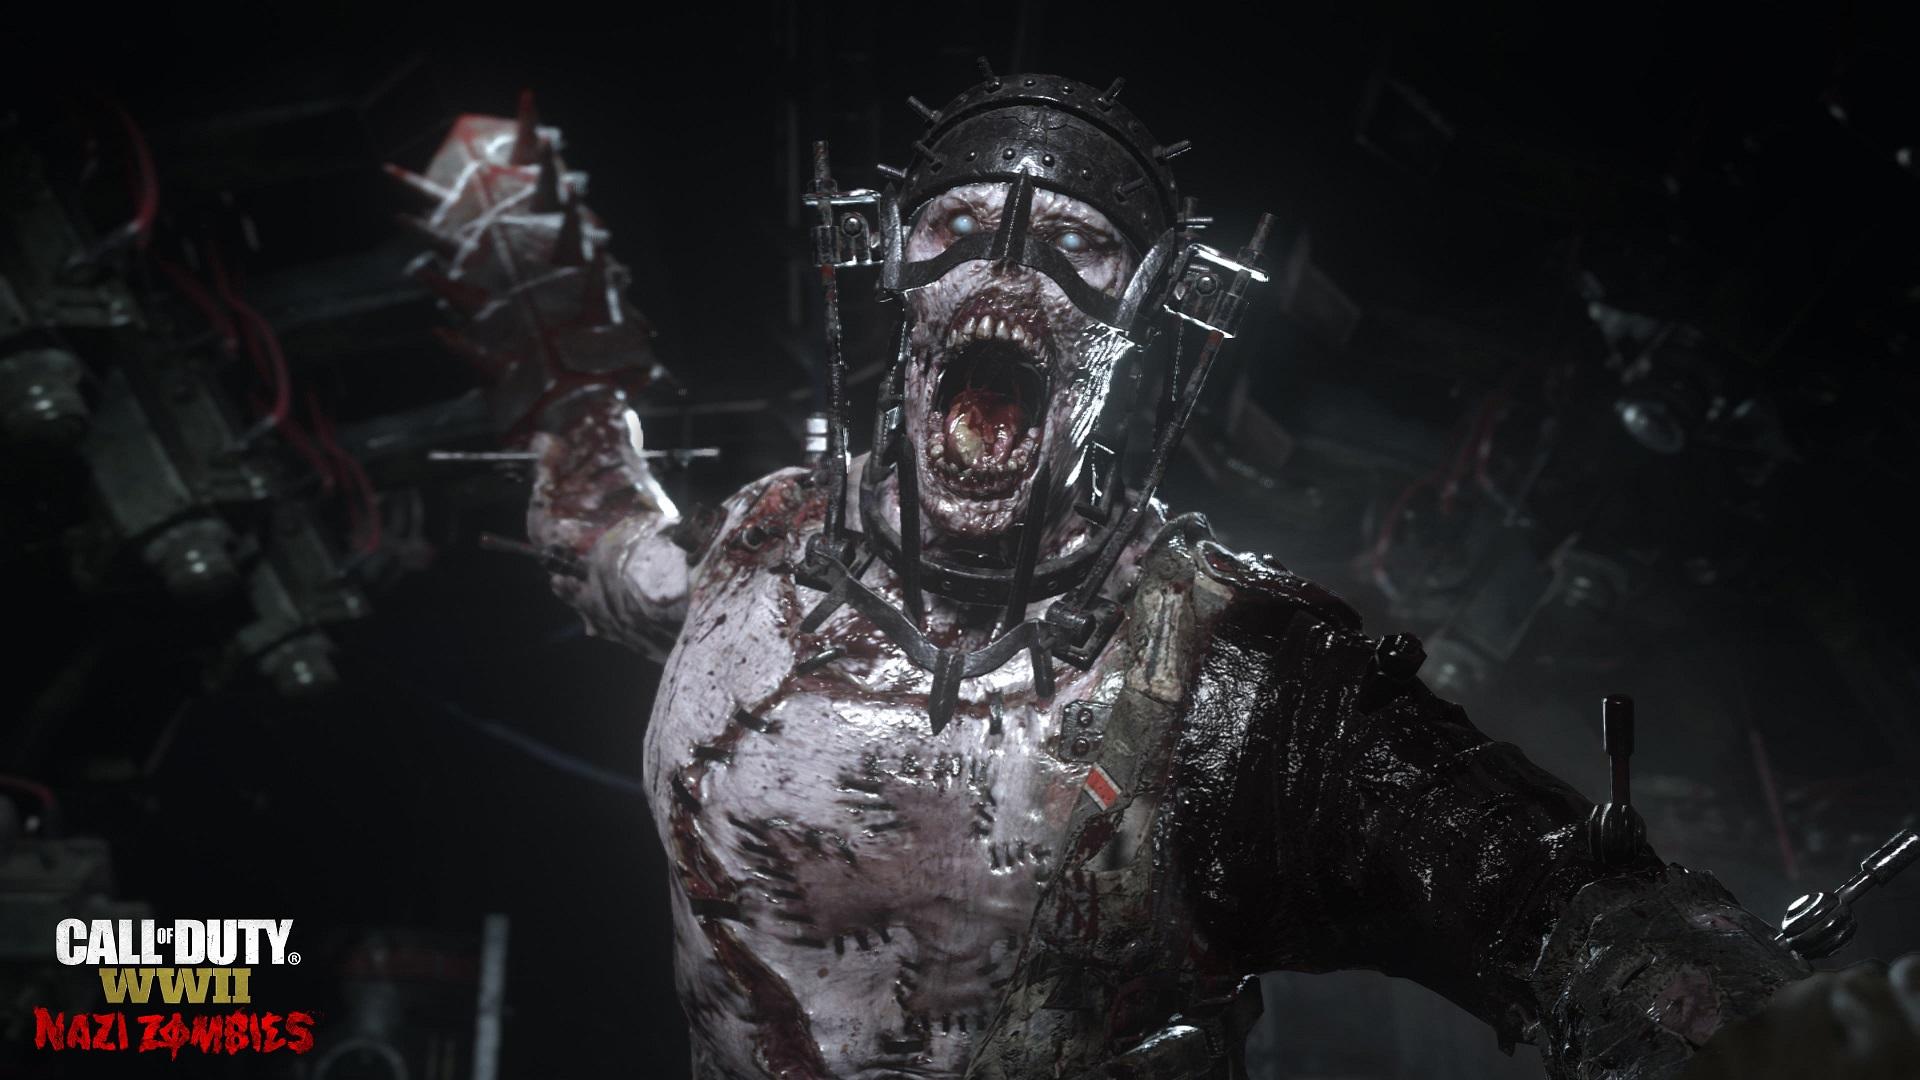 Unduh 410 Koleksi Pubg Zombie Wallpaper Download HD Paling Keren